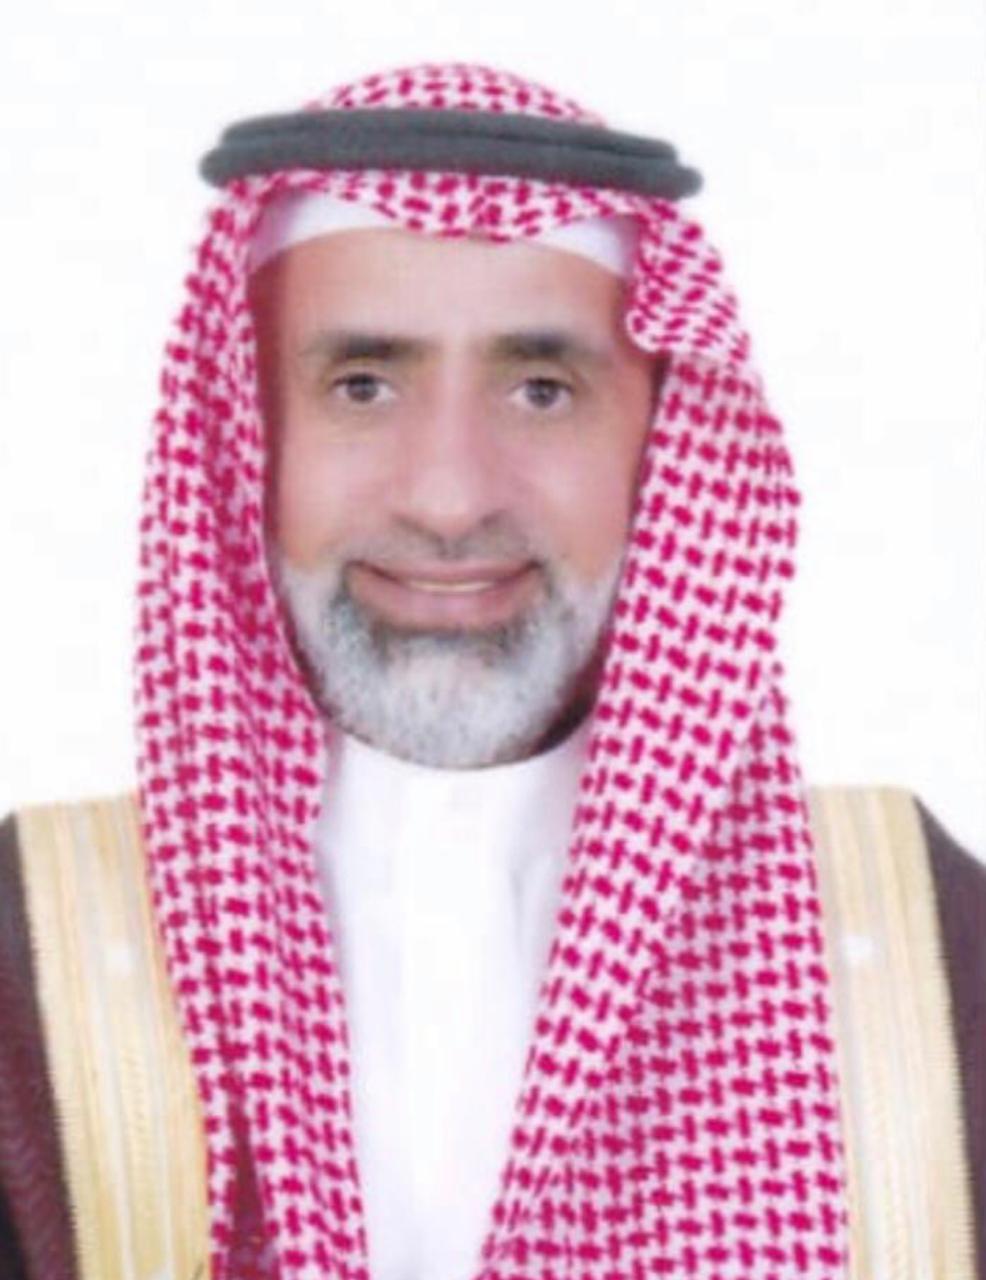 """ماذا استفدت من جائحة كورونا ؟"".. بقلم : د. عثمان آل عثمان"